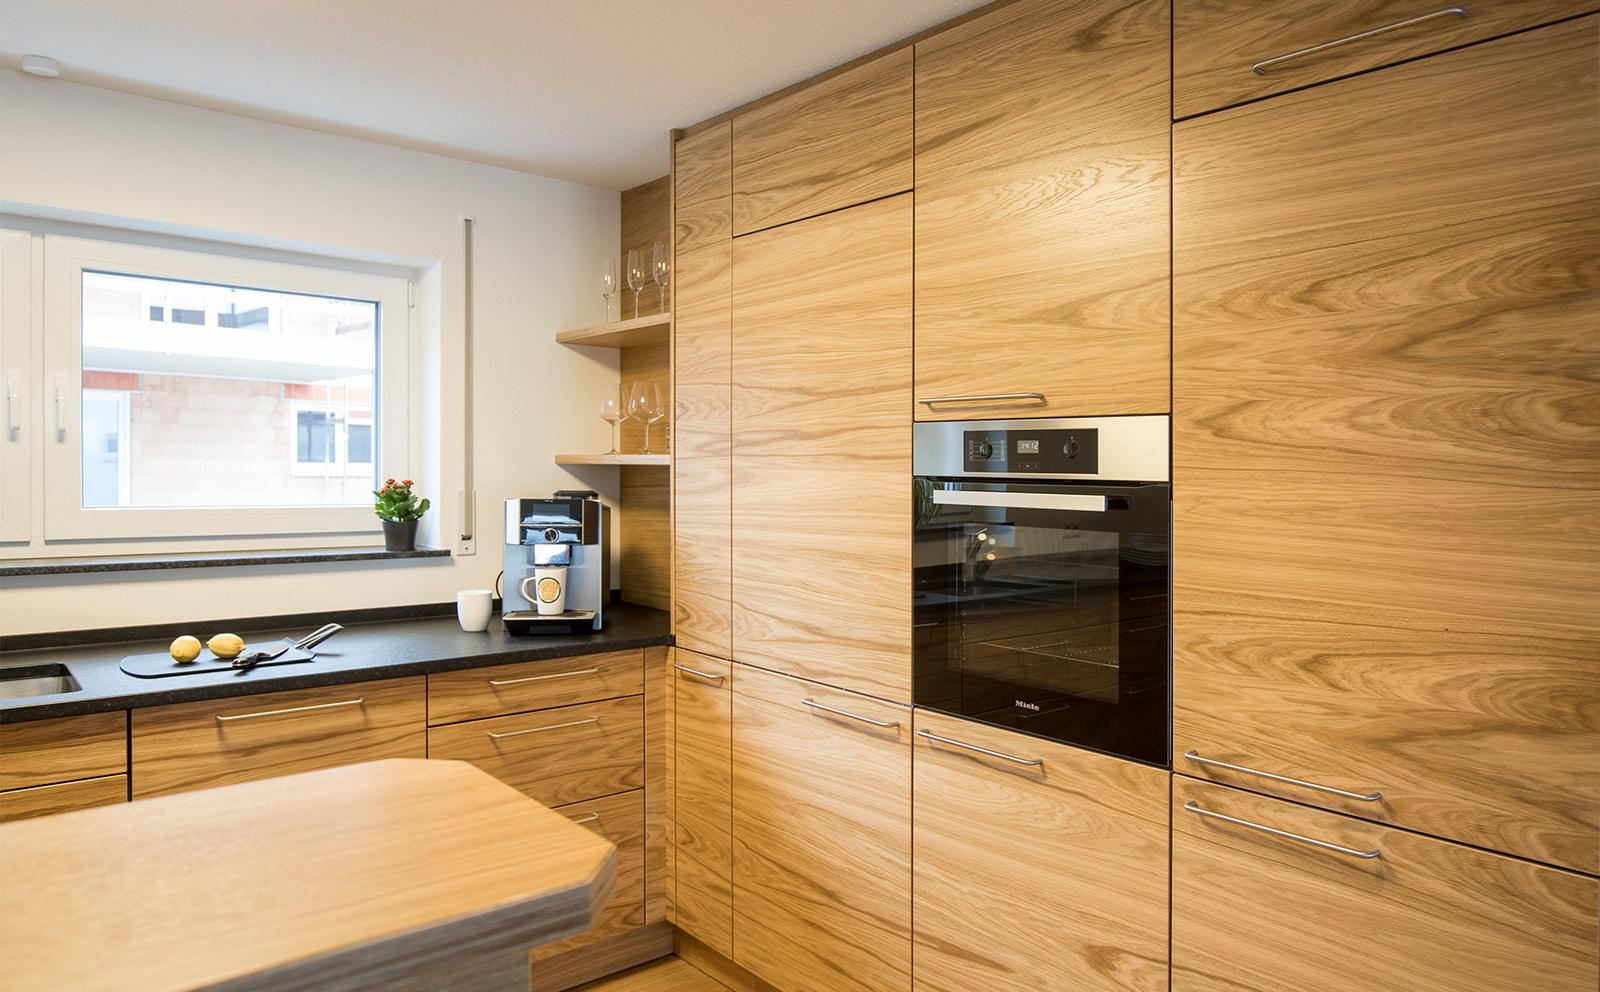 Speisekammertür in Küchenoptik